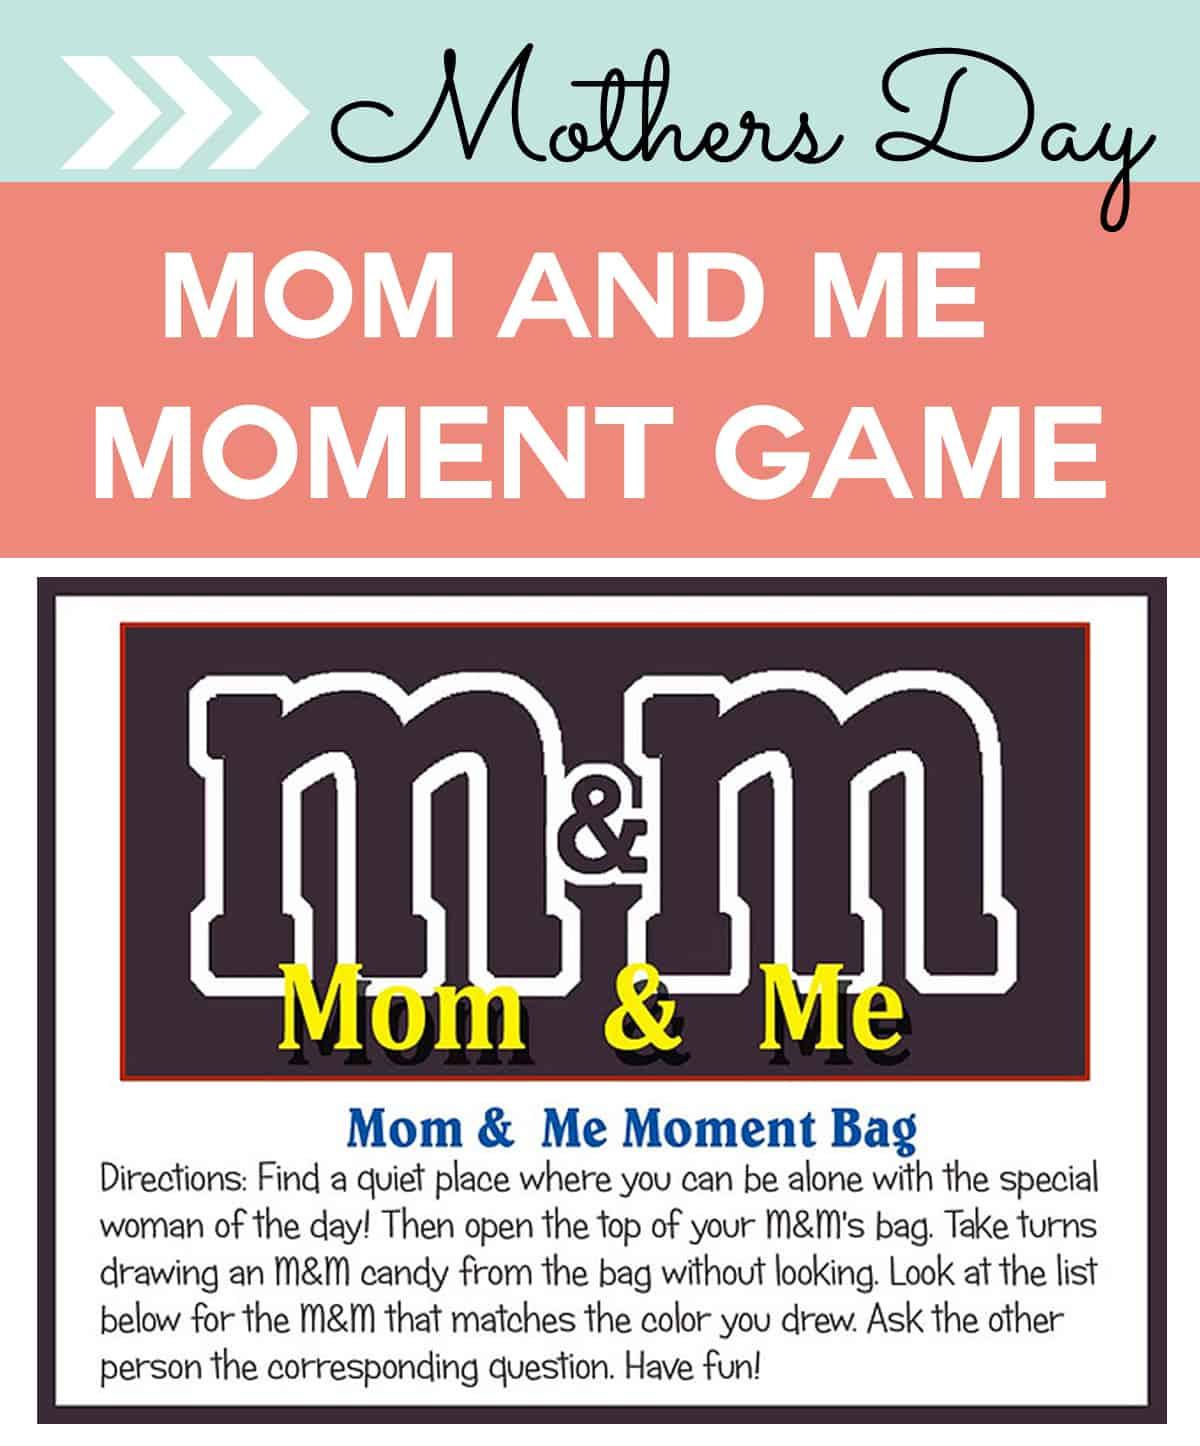 m&m mom & me moment